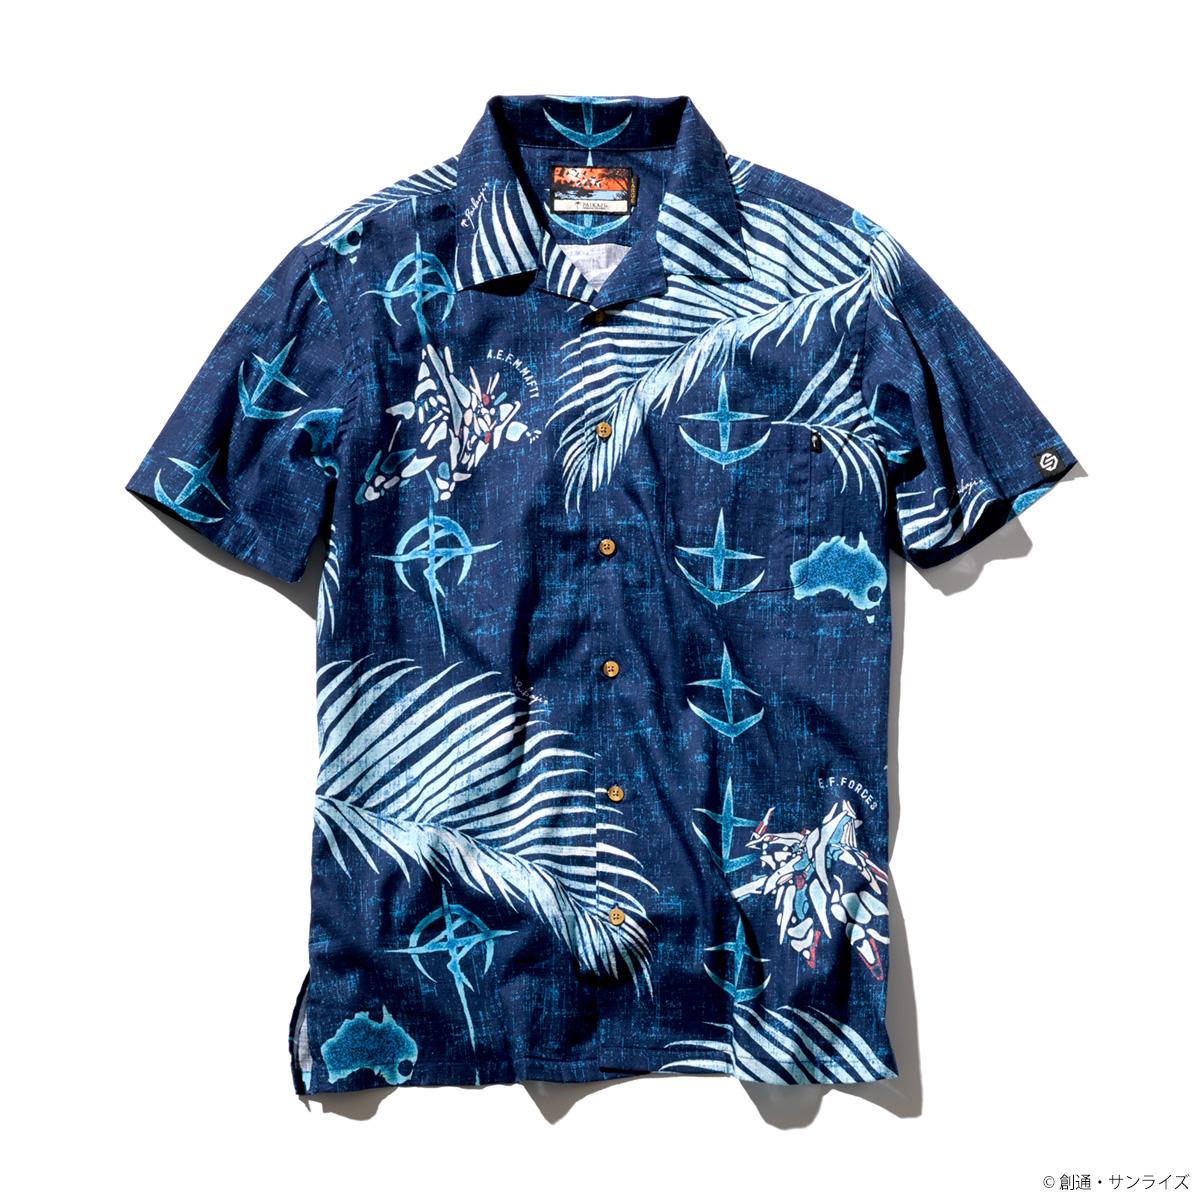 STRICT-G PAIKAJI『機動戦士ガンダム 閃光のハサウェイ』 アロハシャツ VS. Palm leaf